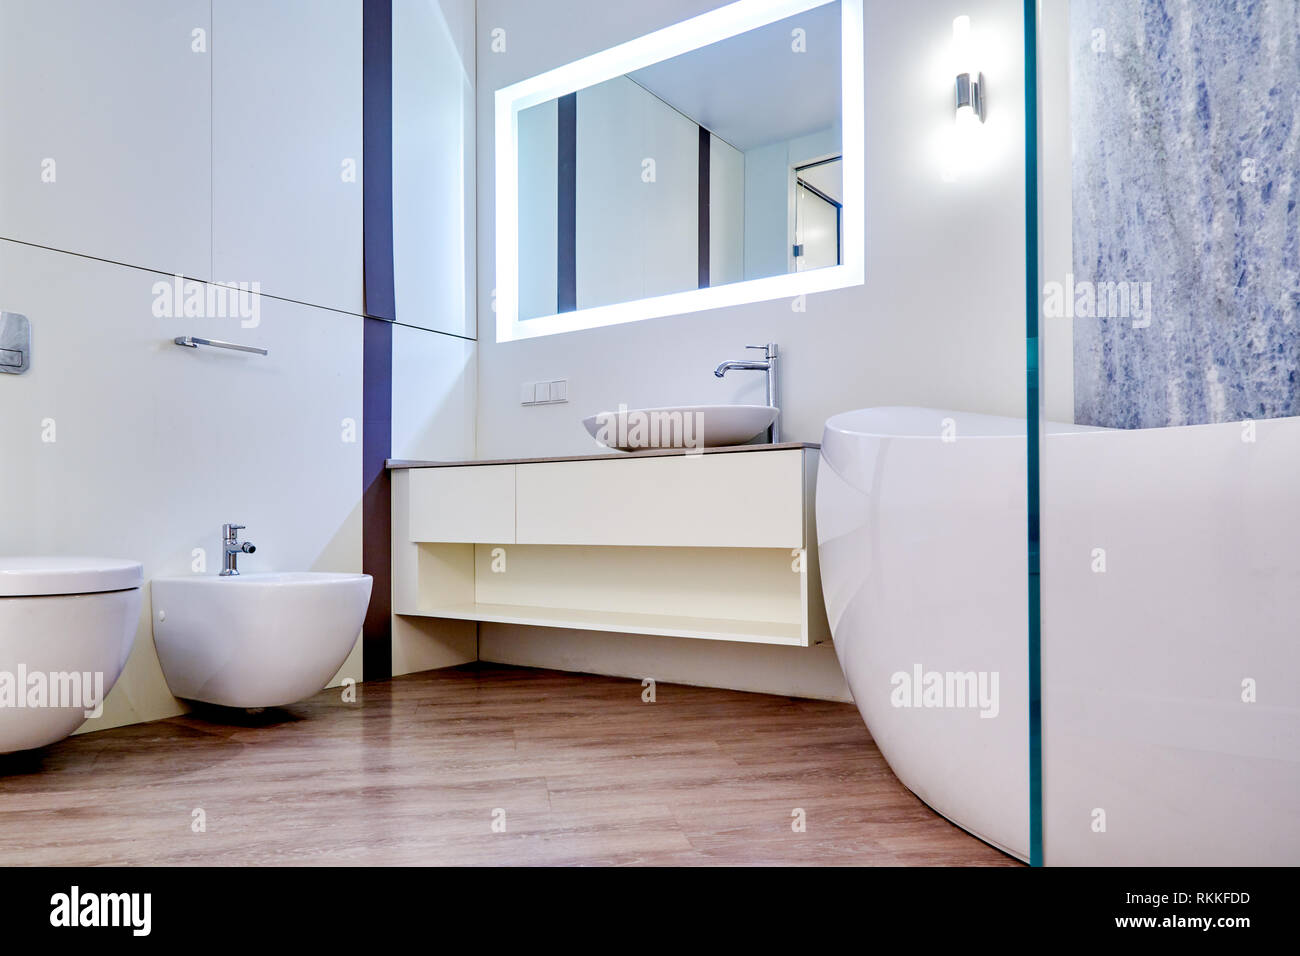 Beautiful Interior of a Modern Bathroom. Interior Architecture Stock Photo